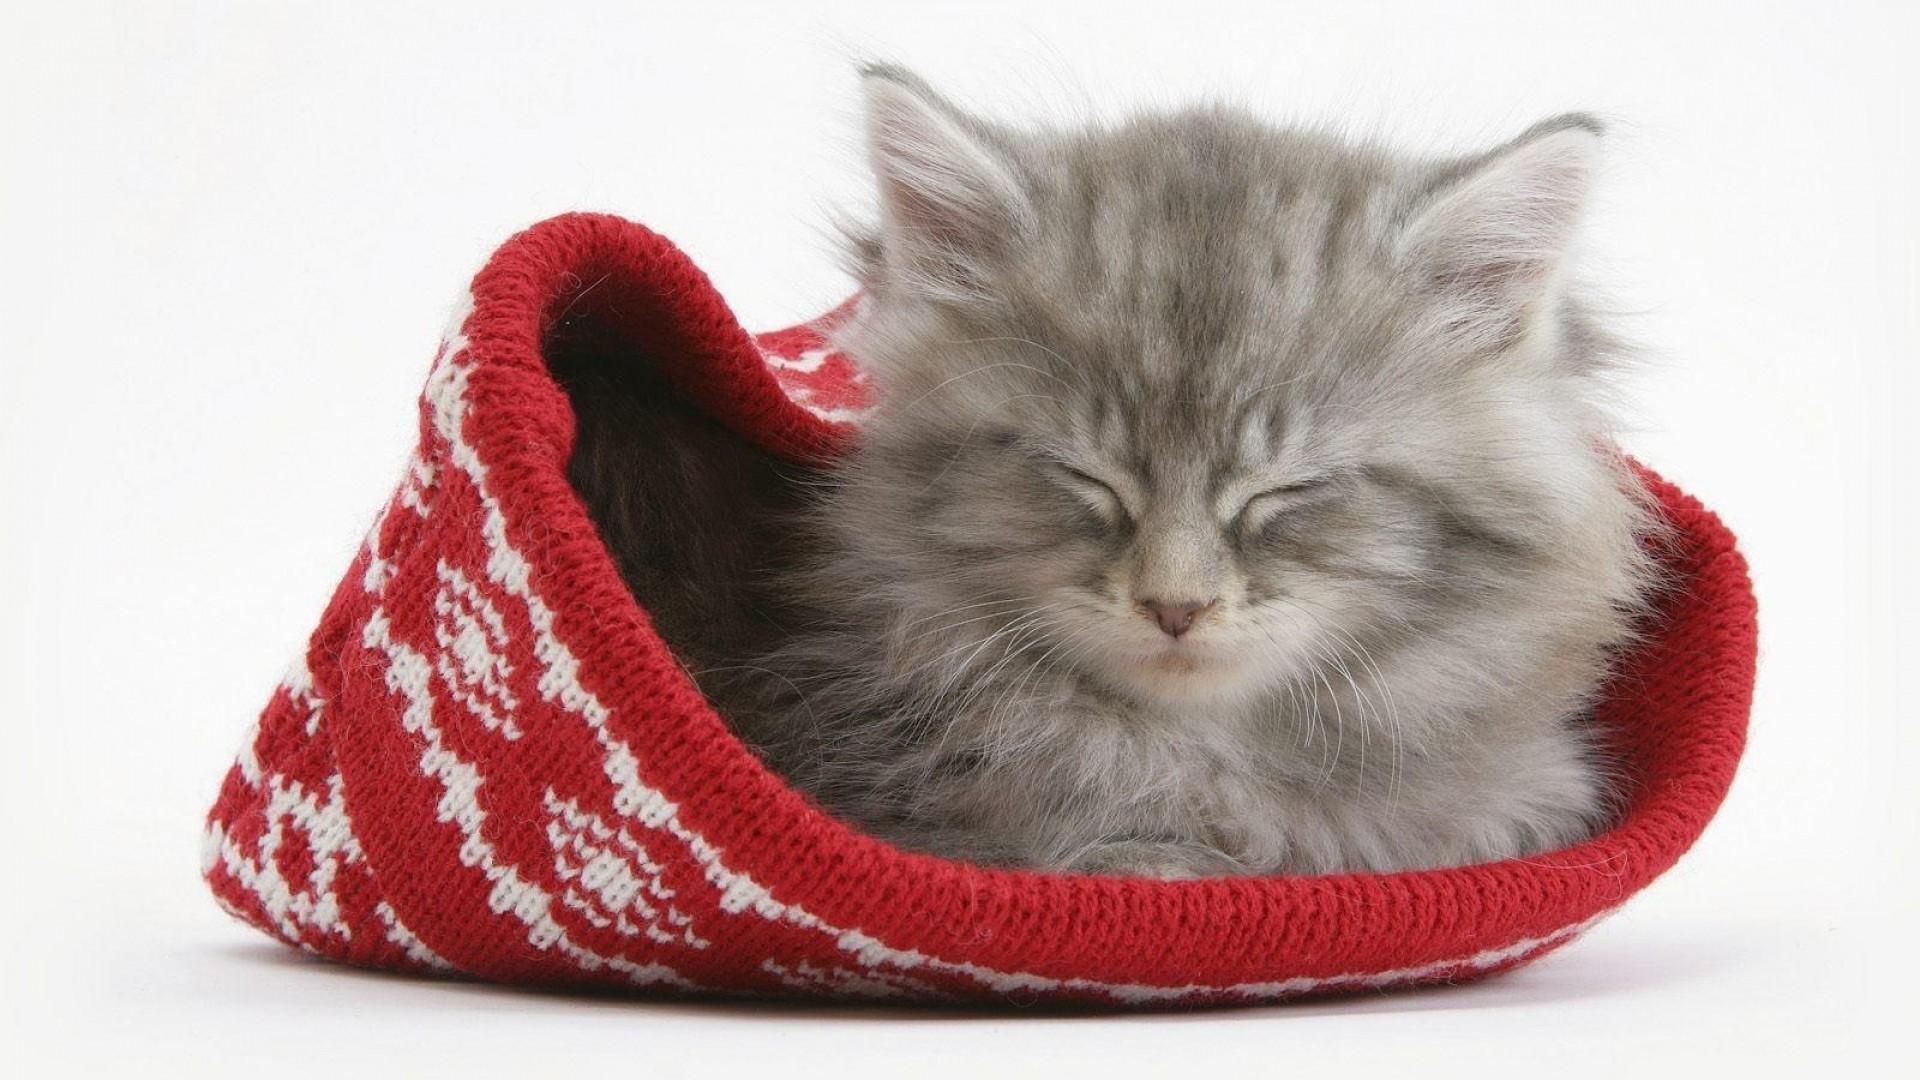 Wallpaper cat, hat, sleeping, furry